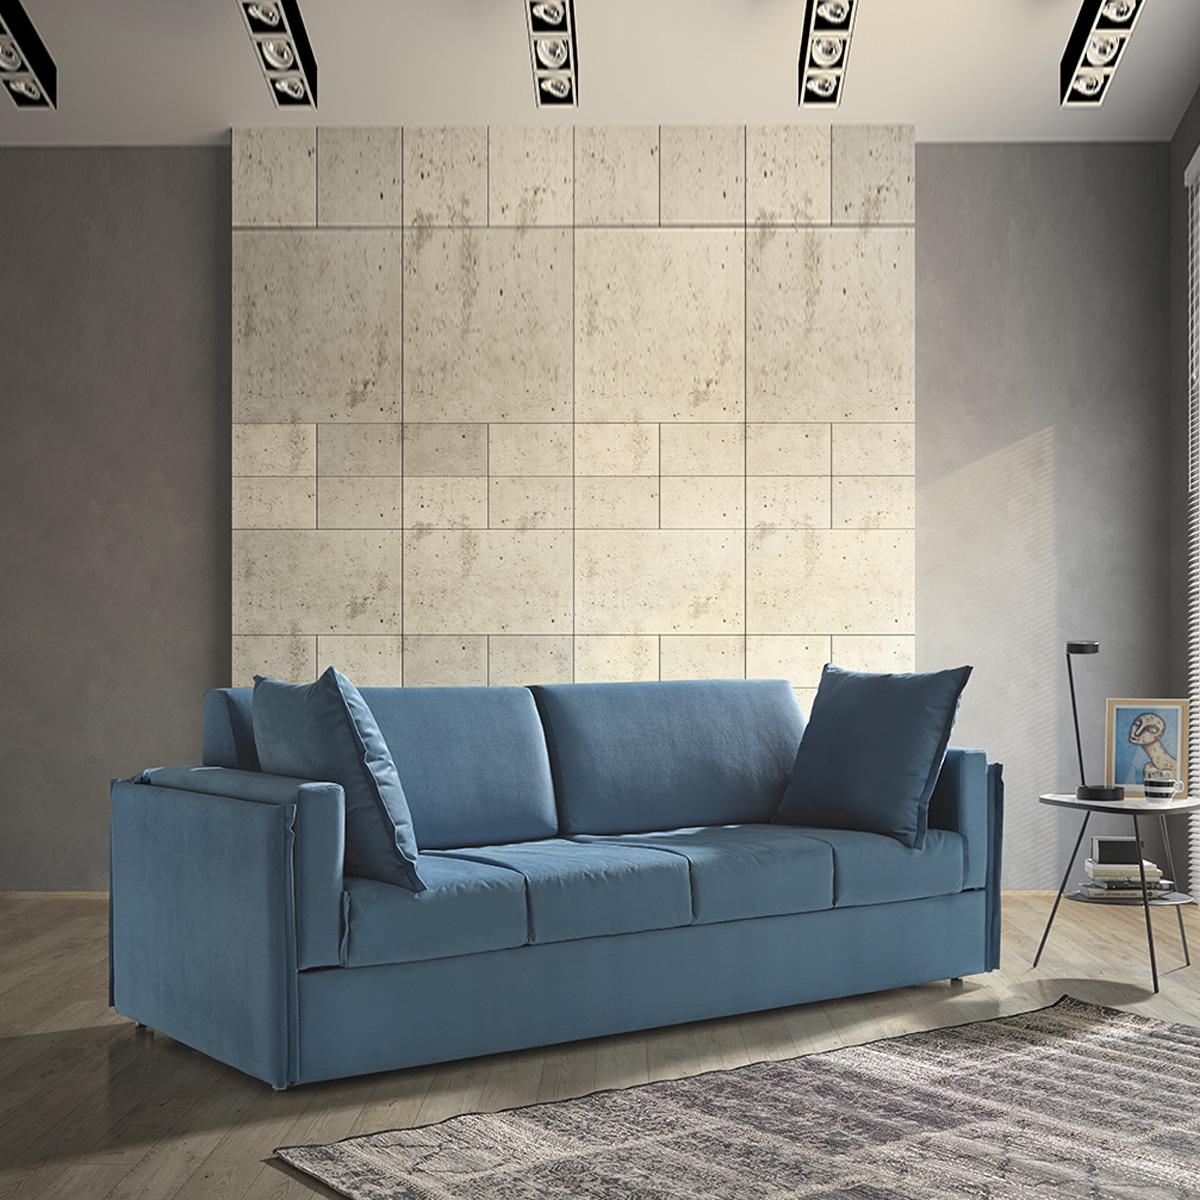 Sofa Cama Litera Q0d4 Bunk sofa Bed 35 Nessen